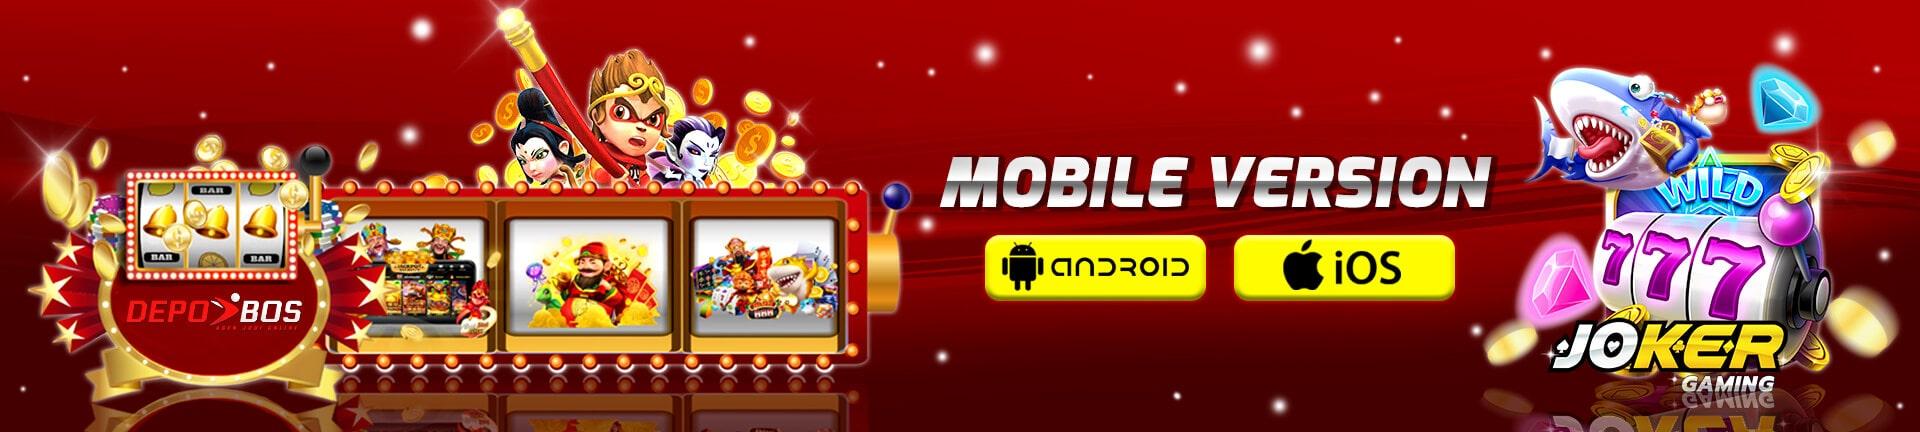 Promo Bonus Joker88 Slot Online Terbesar